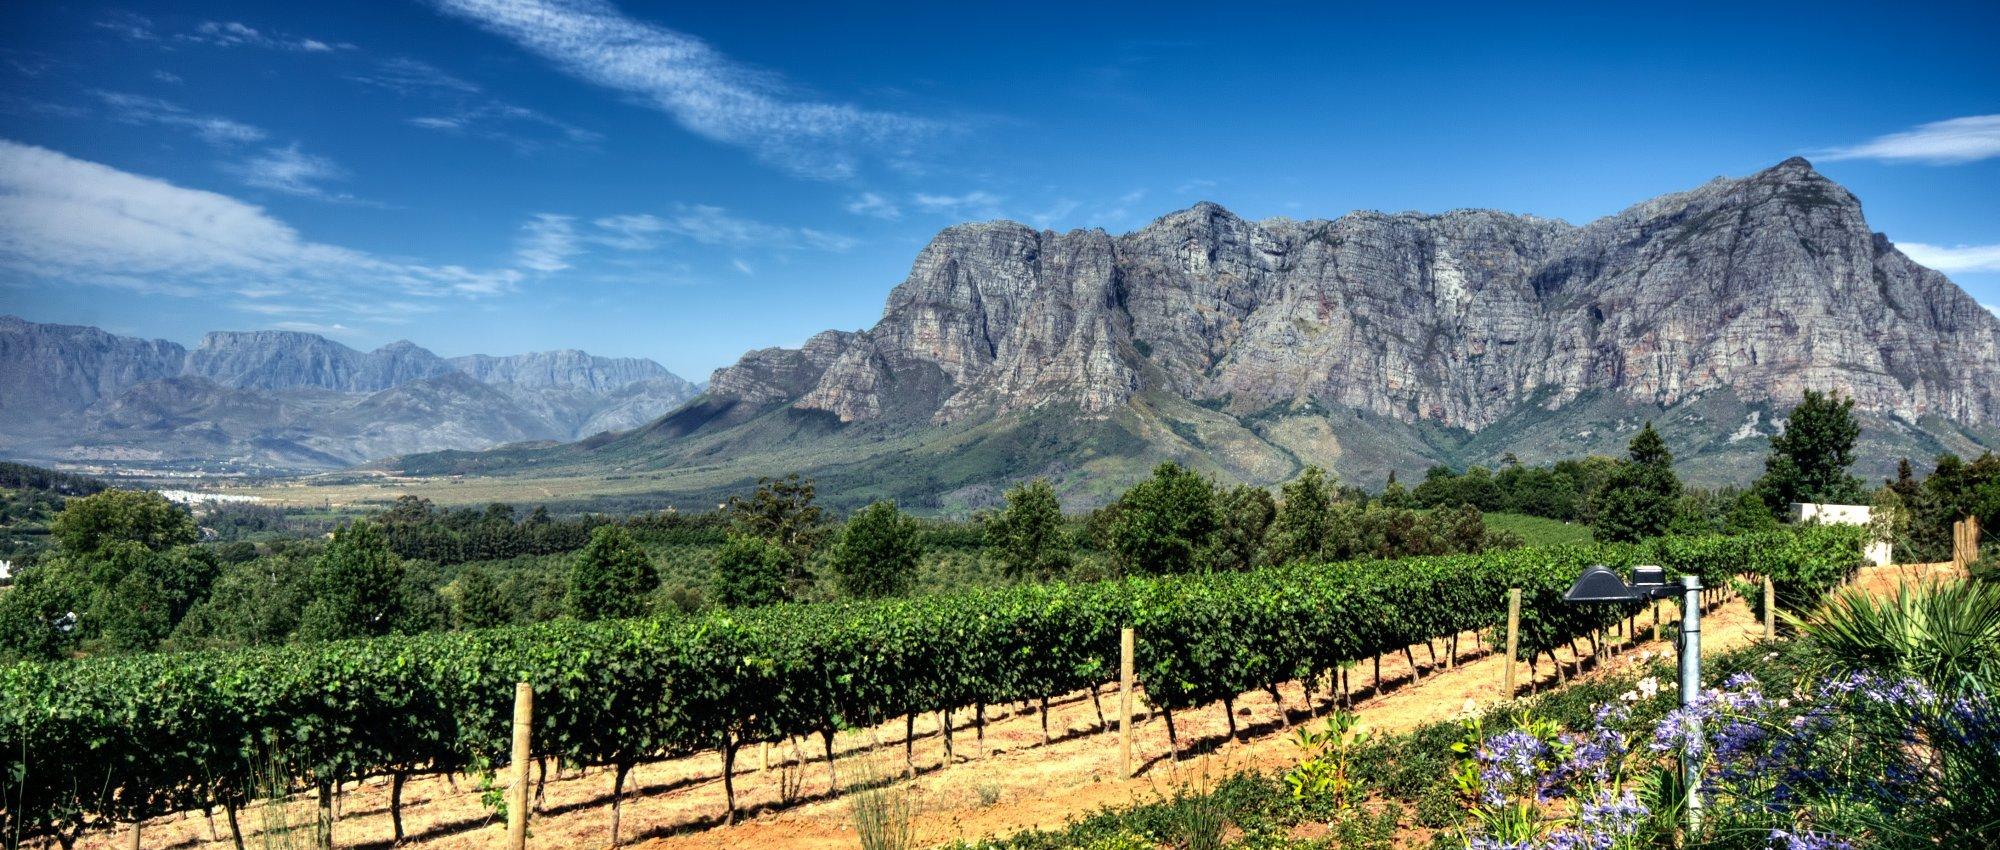 Best Winery Tours In Spain